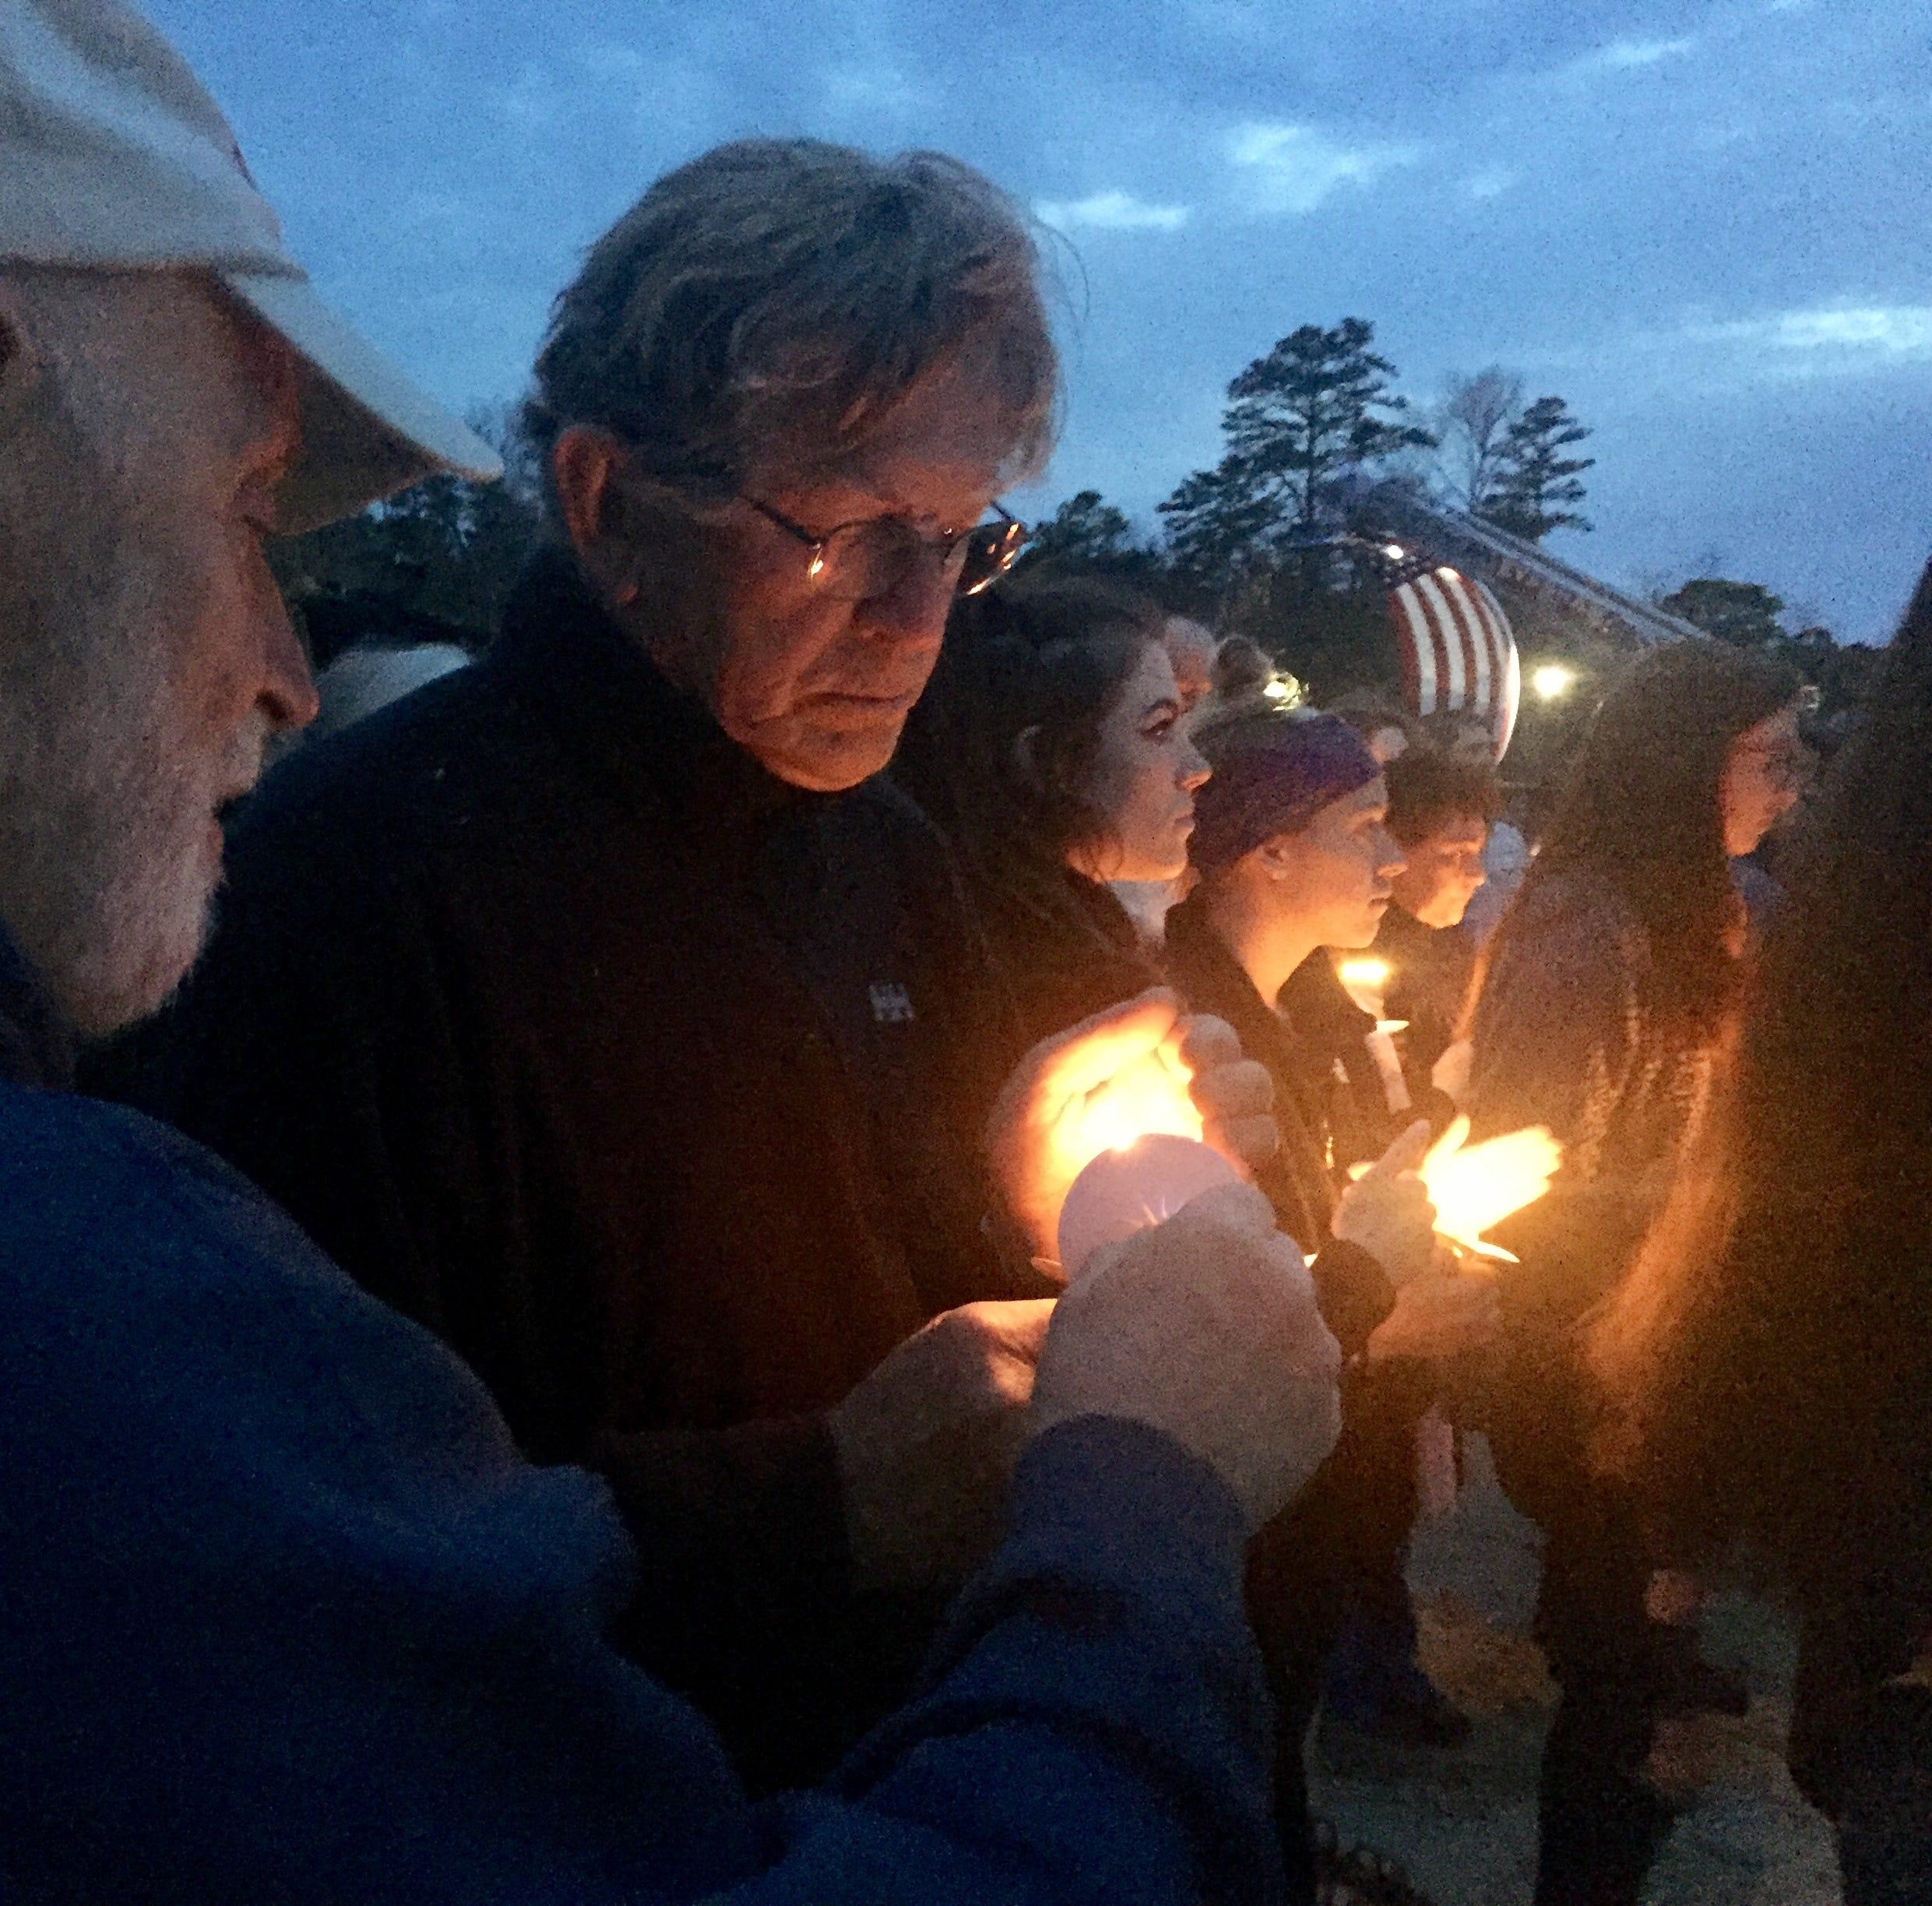 Fallen soldier recalled as 'ultimate best friend' at Medford Lakes vigil